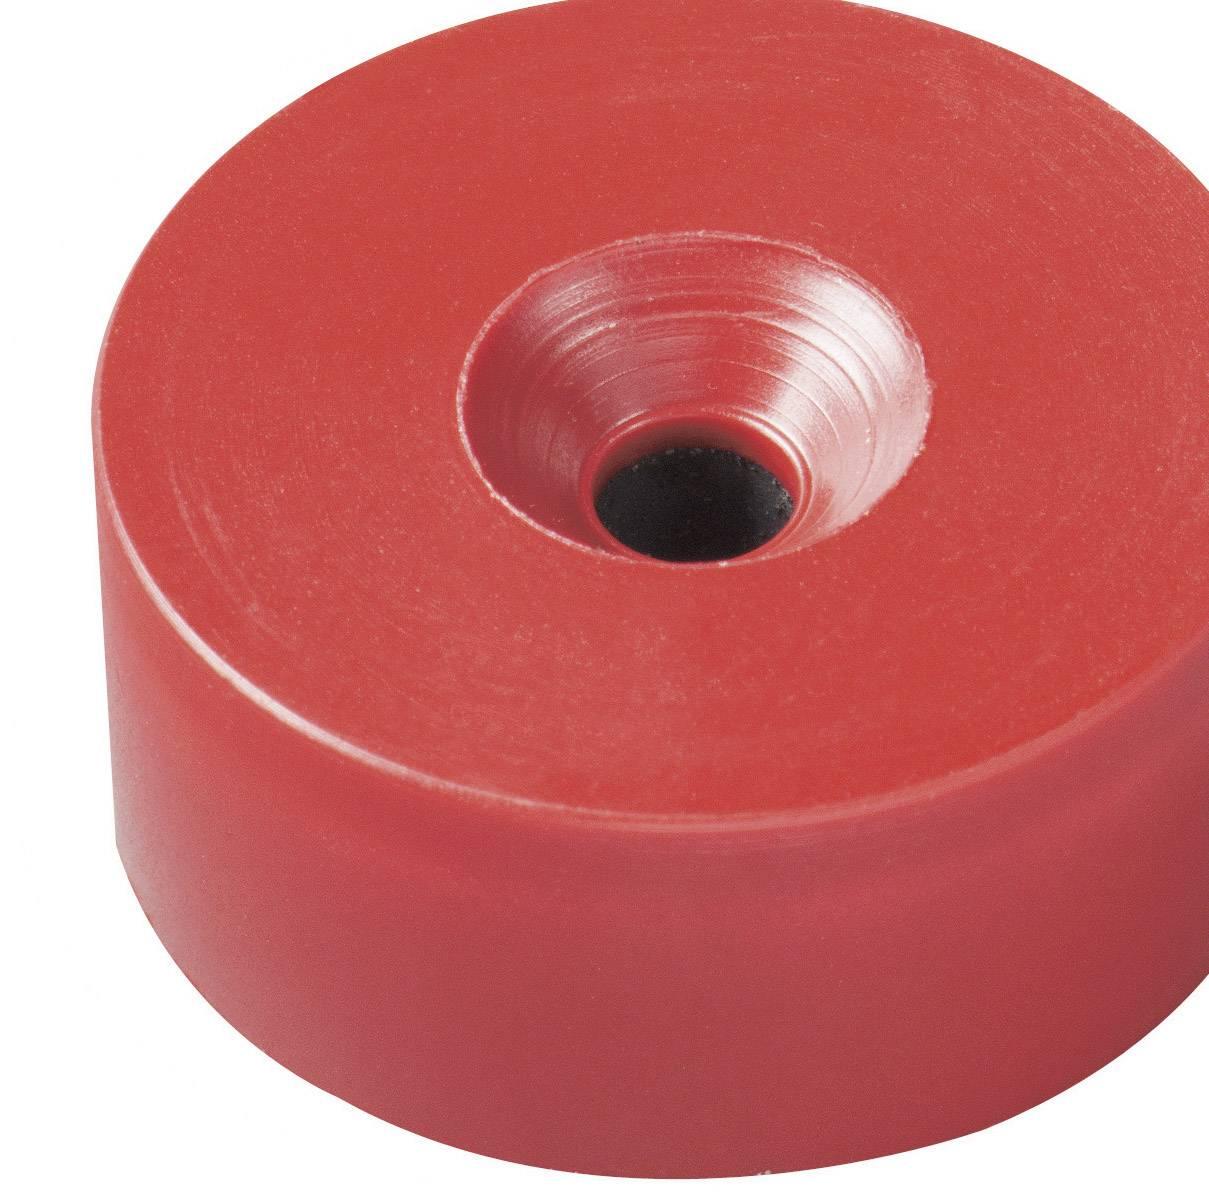 Magnet Elobau 300780, 26 x 11 mm, bez pouzdra